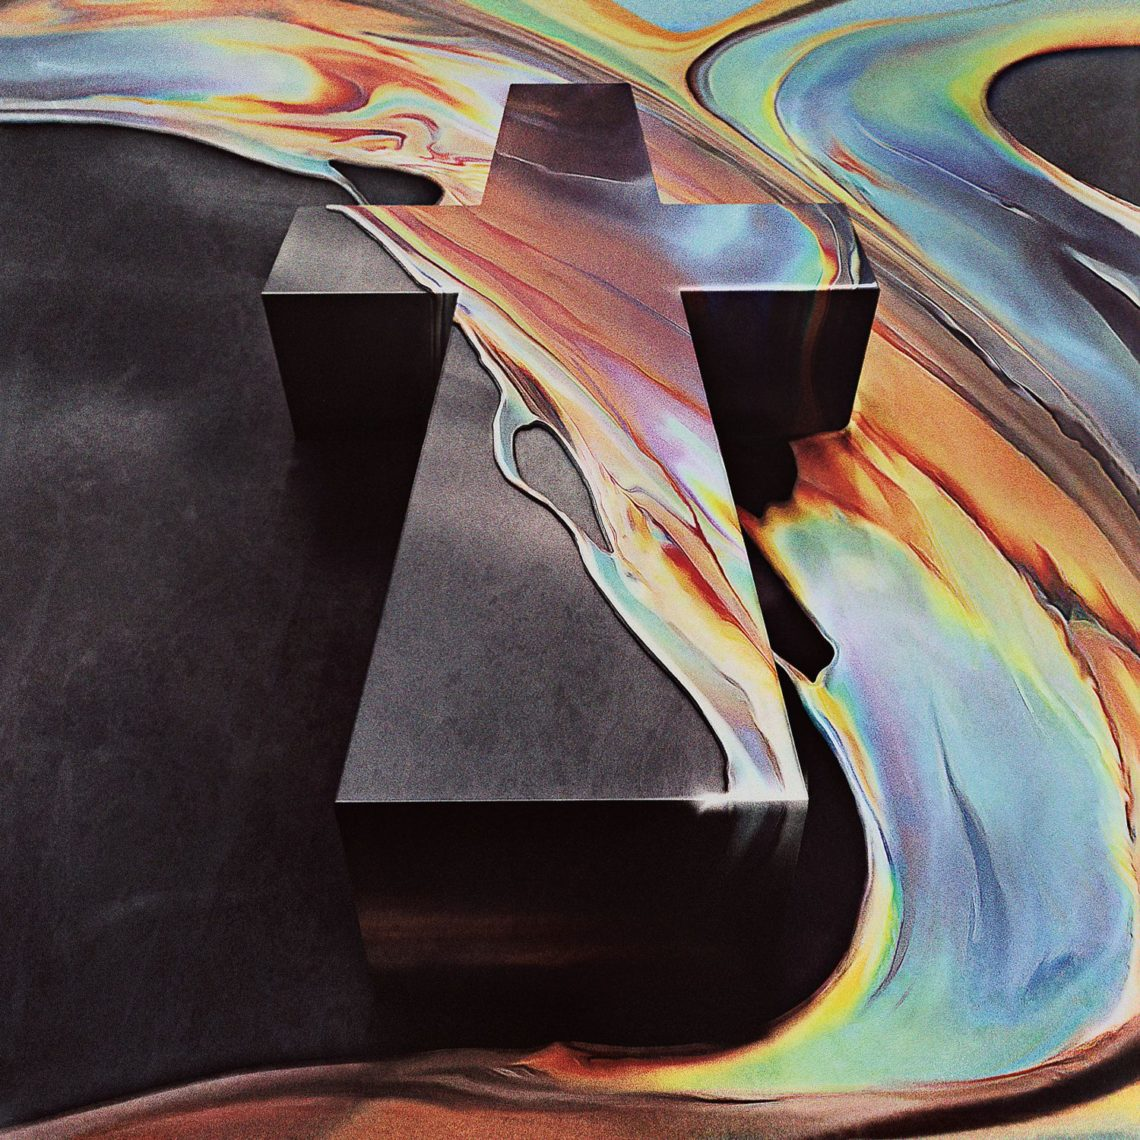 "Justice выпустили видео на сингл ""Fire"" с Сьюзен Сарандон в главной роли"